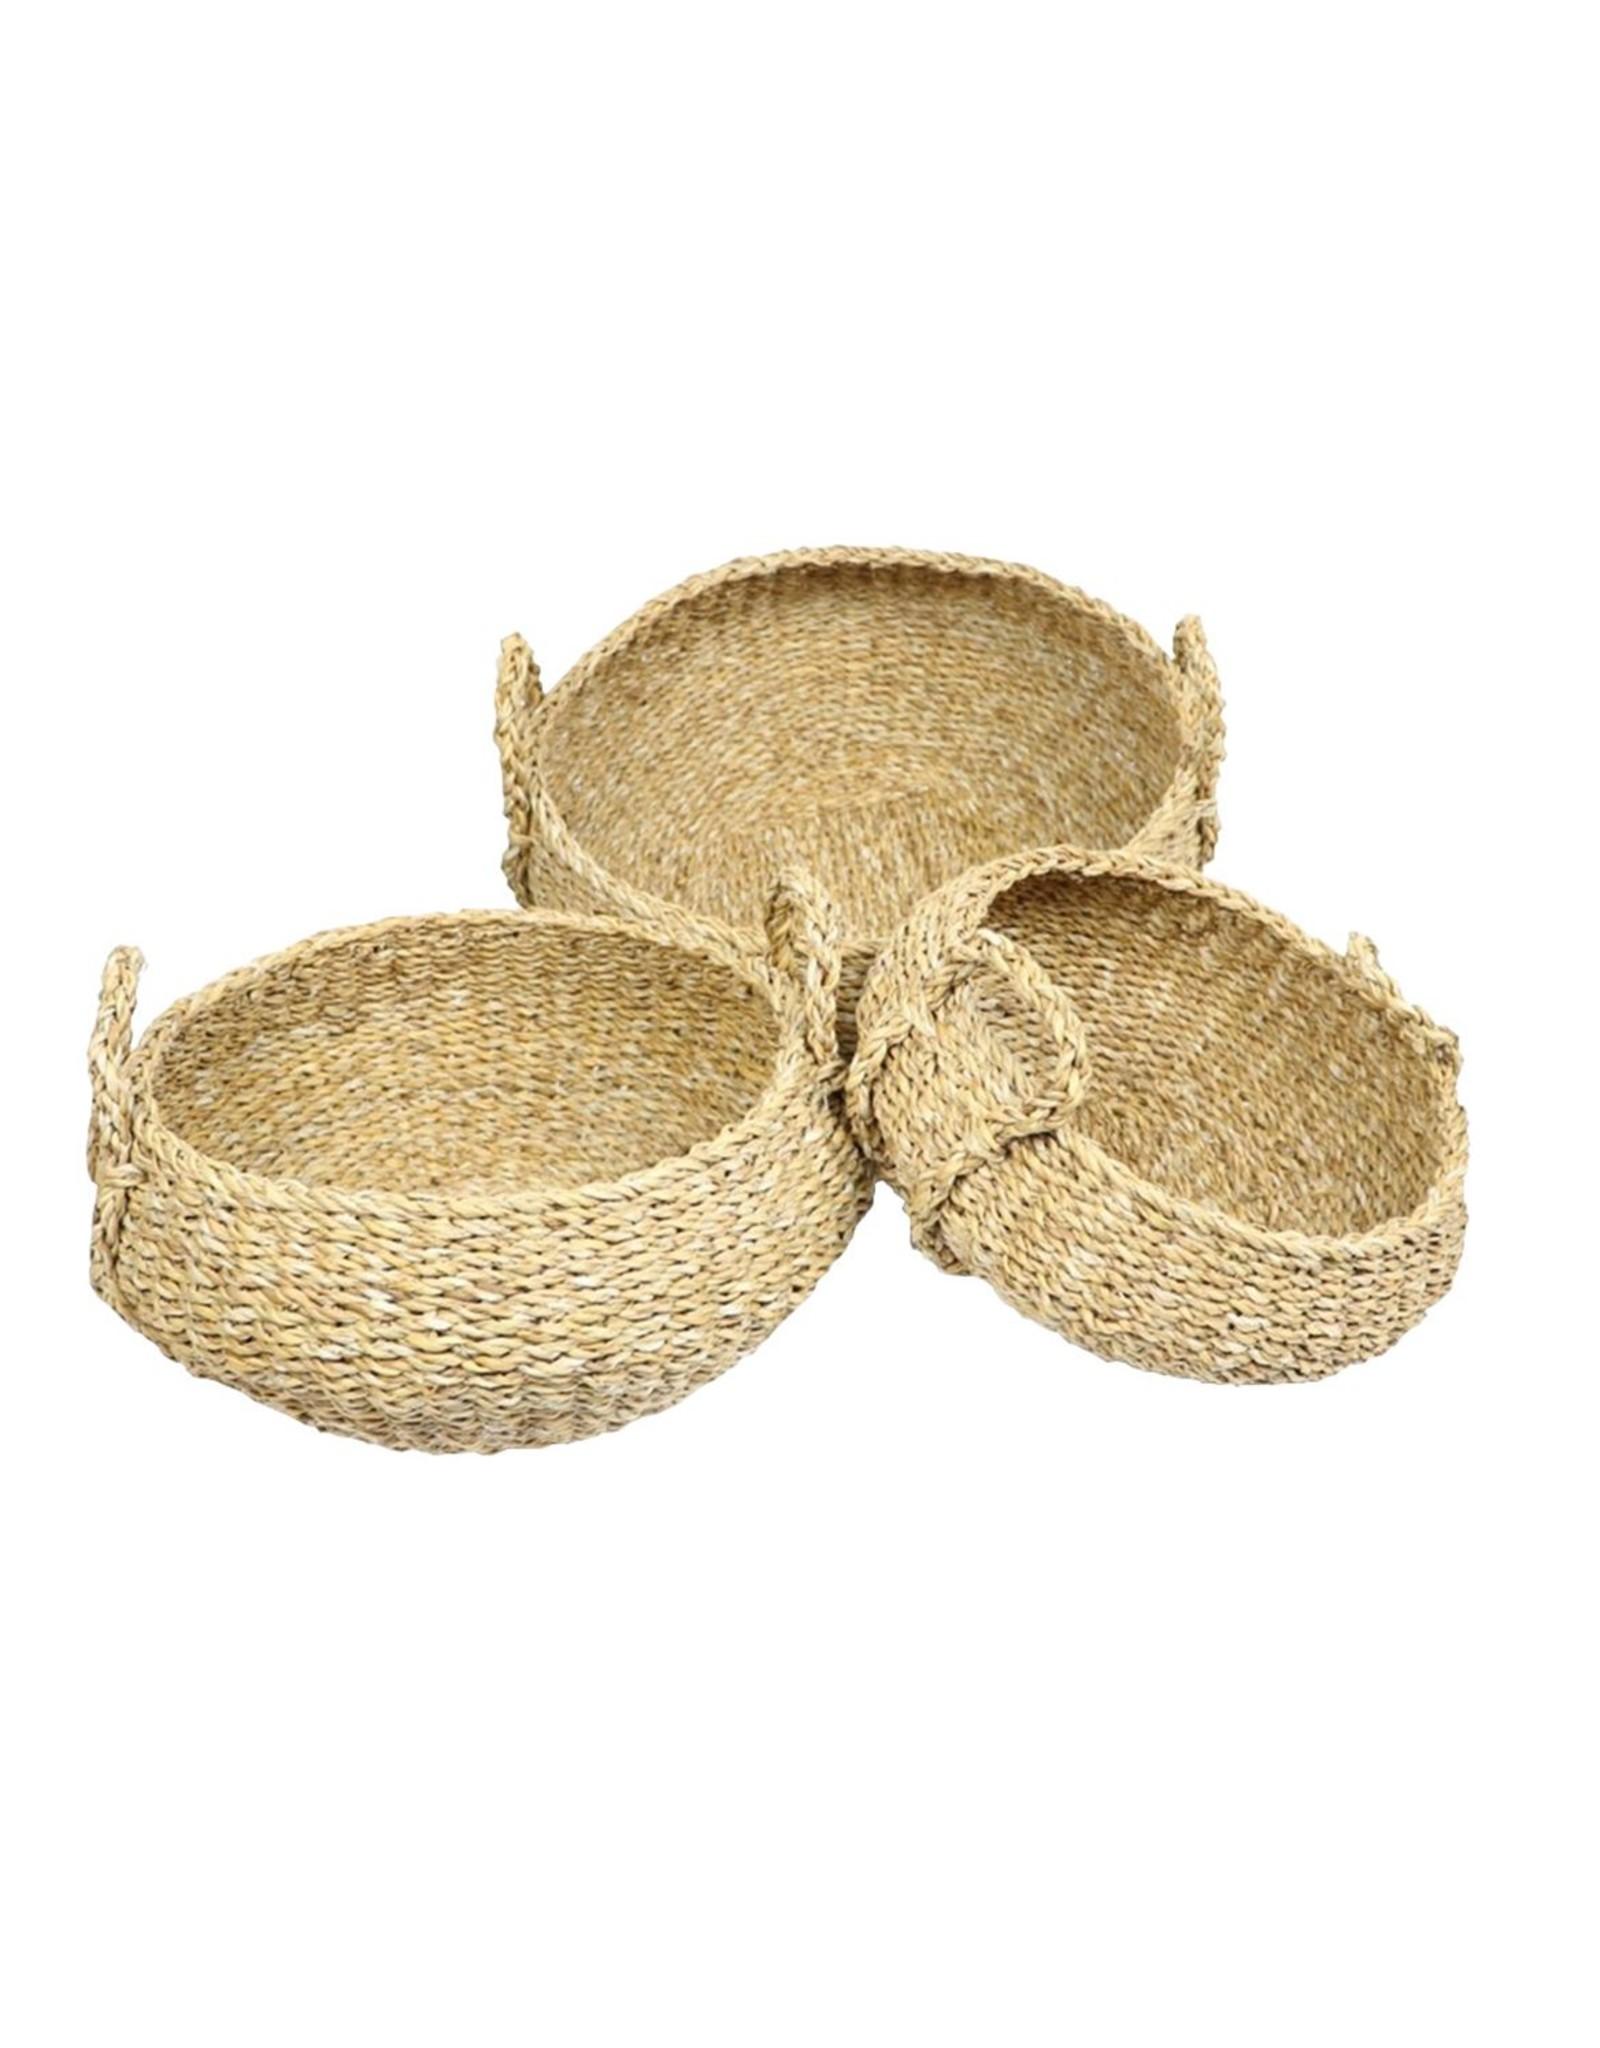 HD Bask. Manatee Grass S/3 ( x 1 )